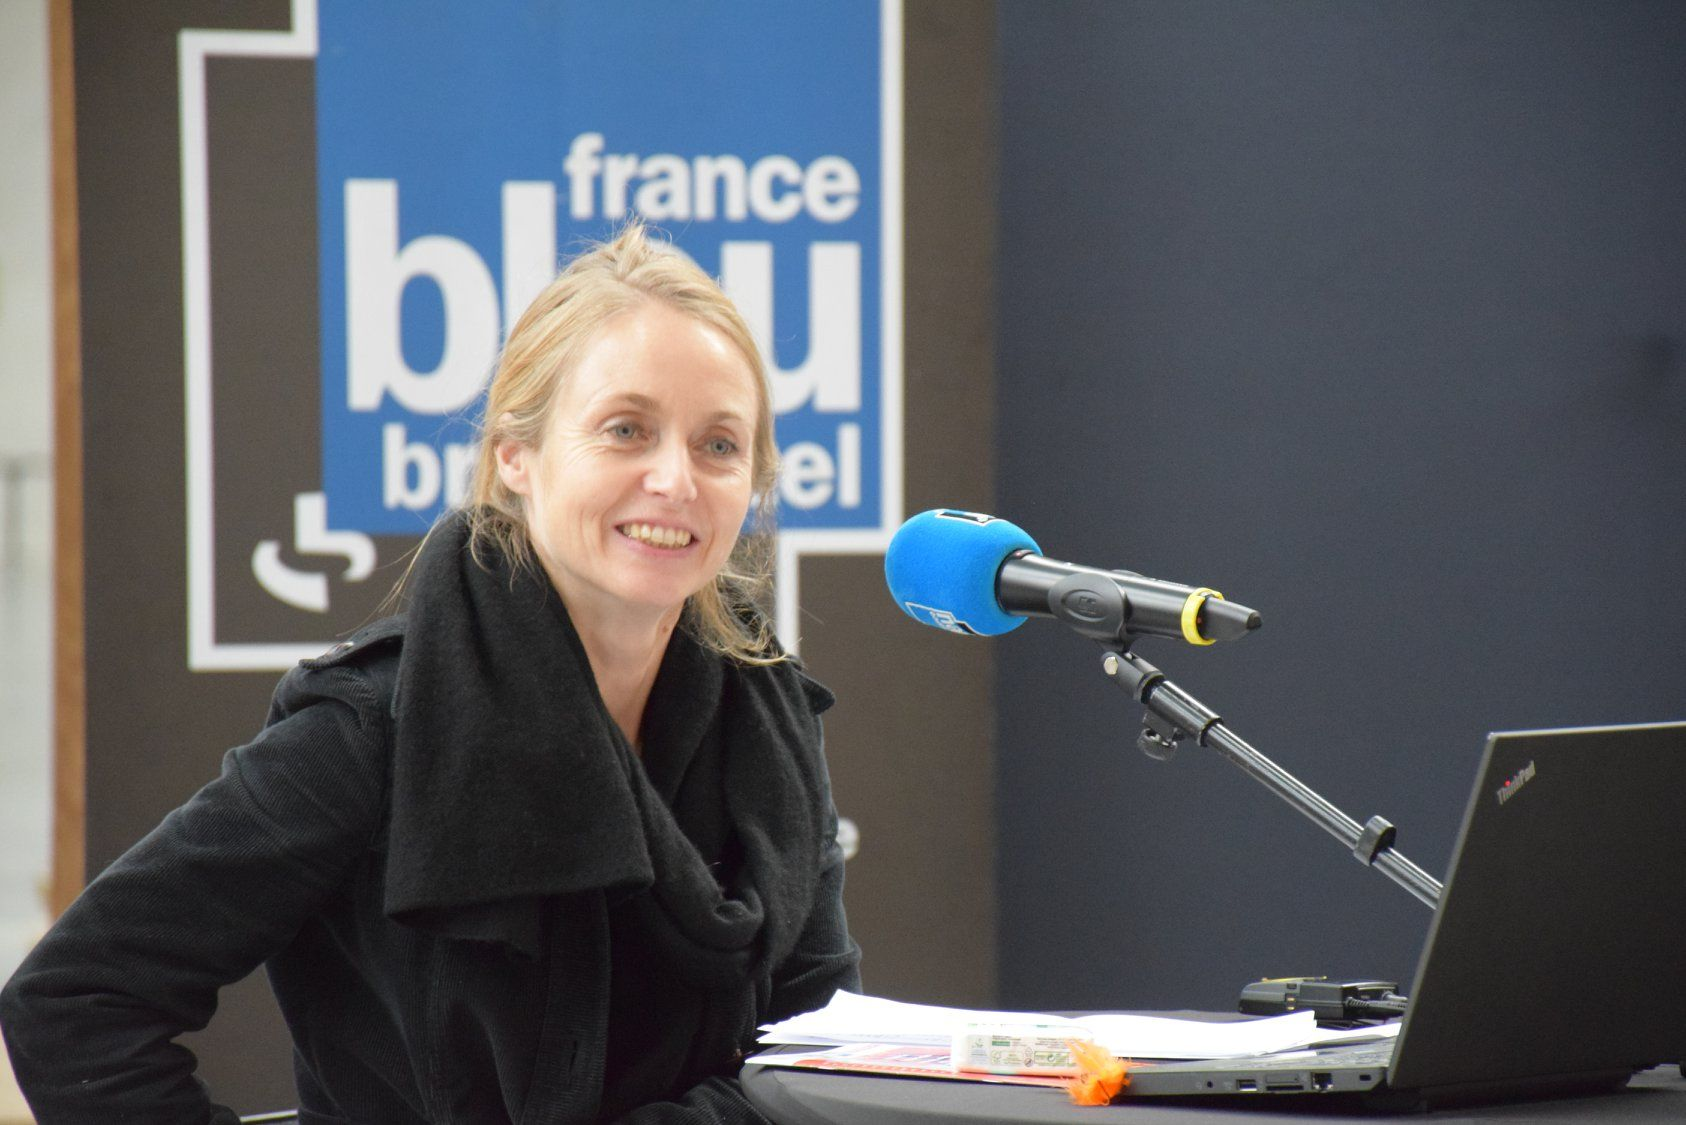 Erell Beloni